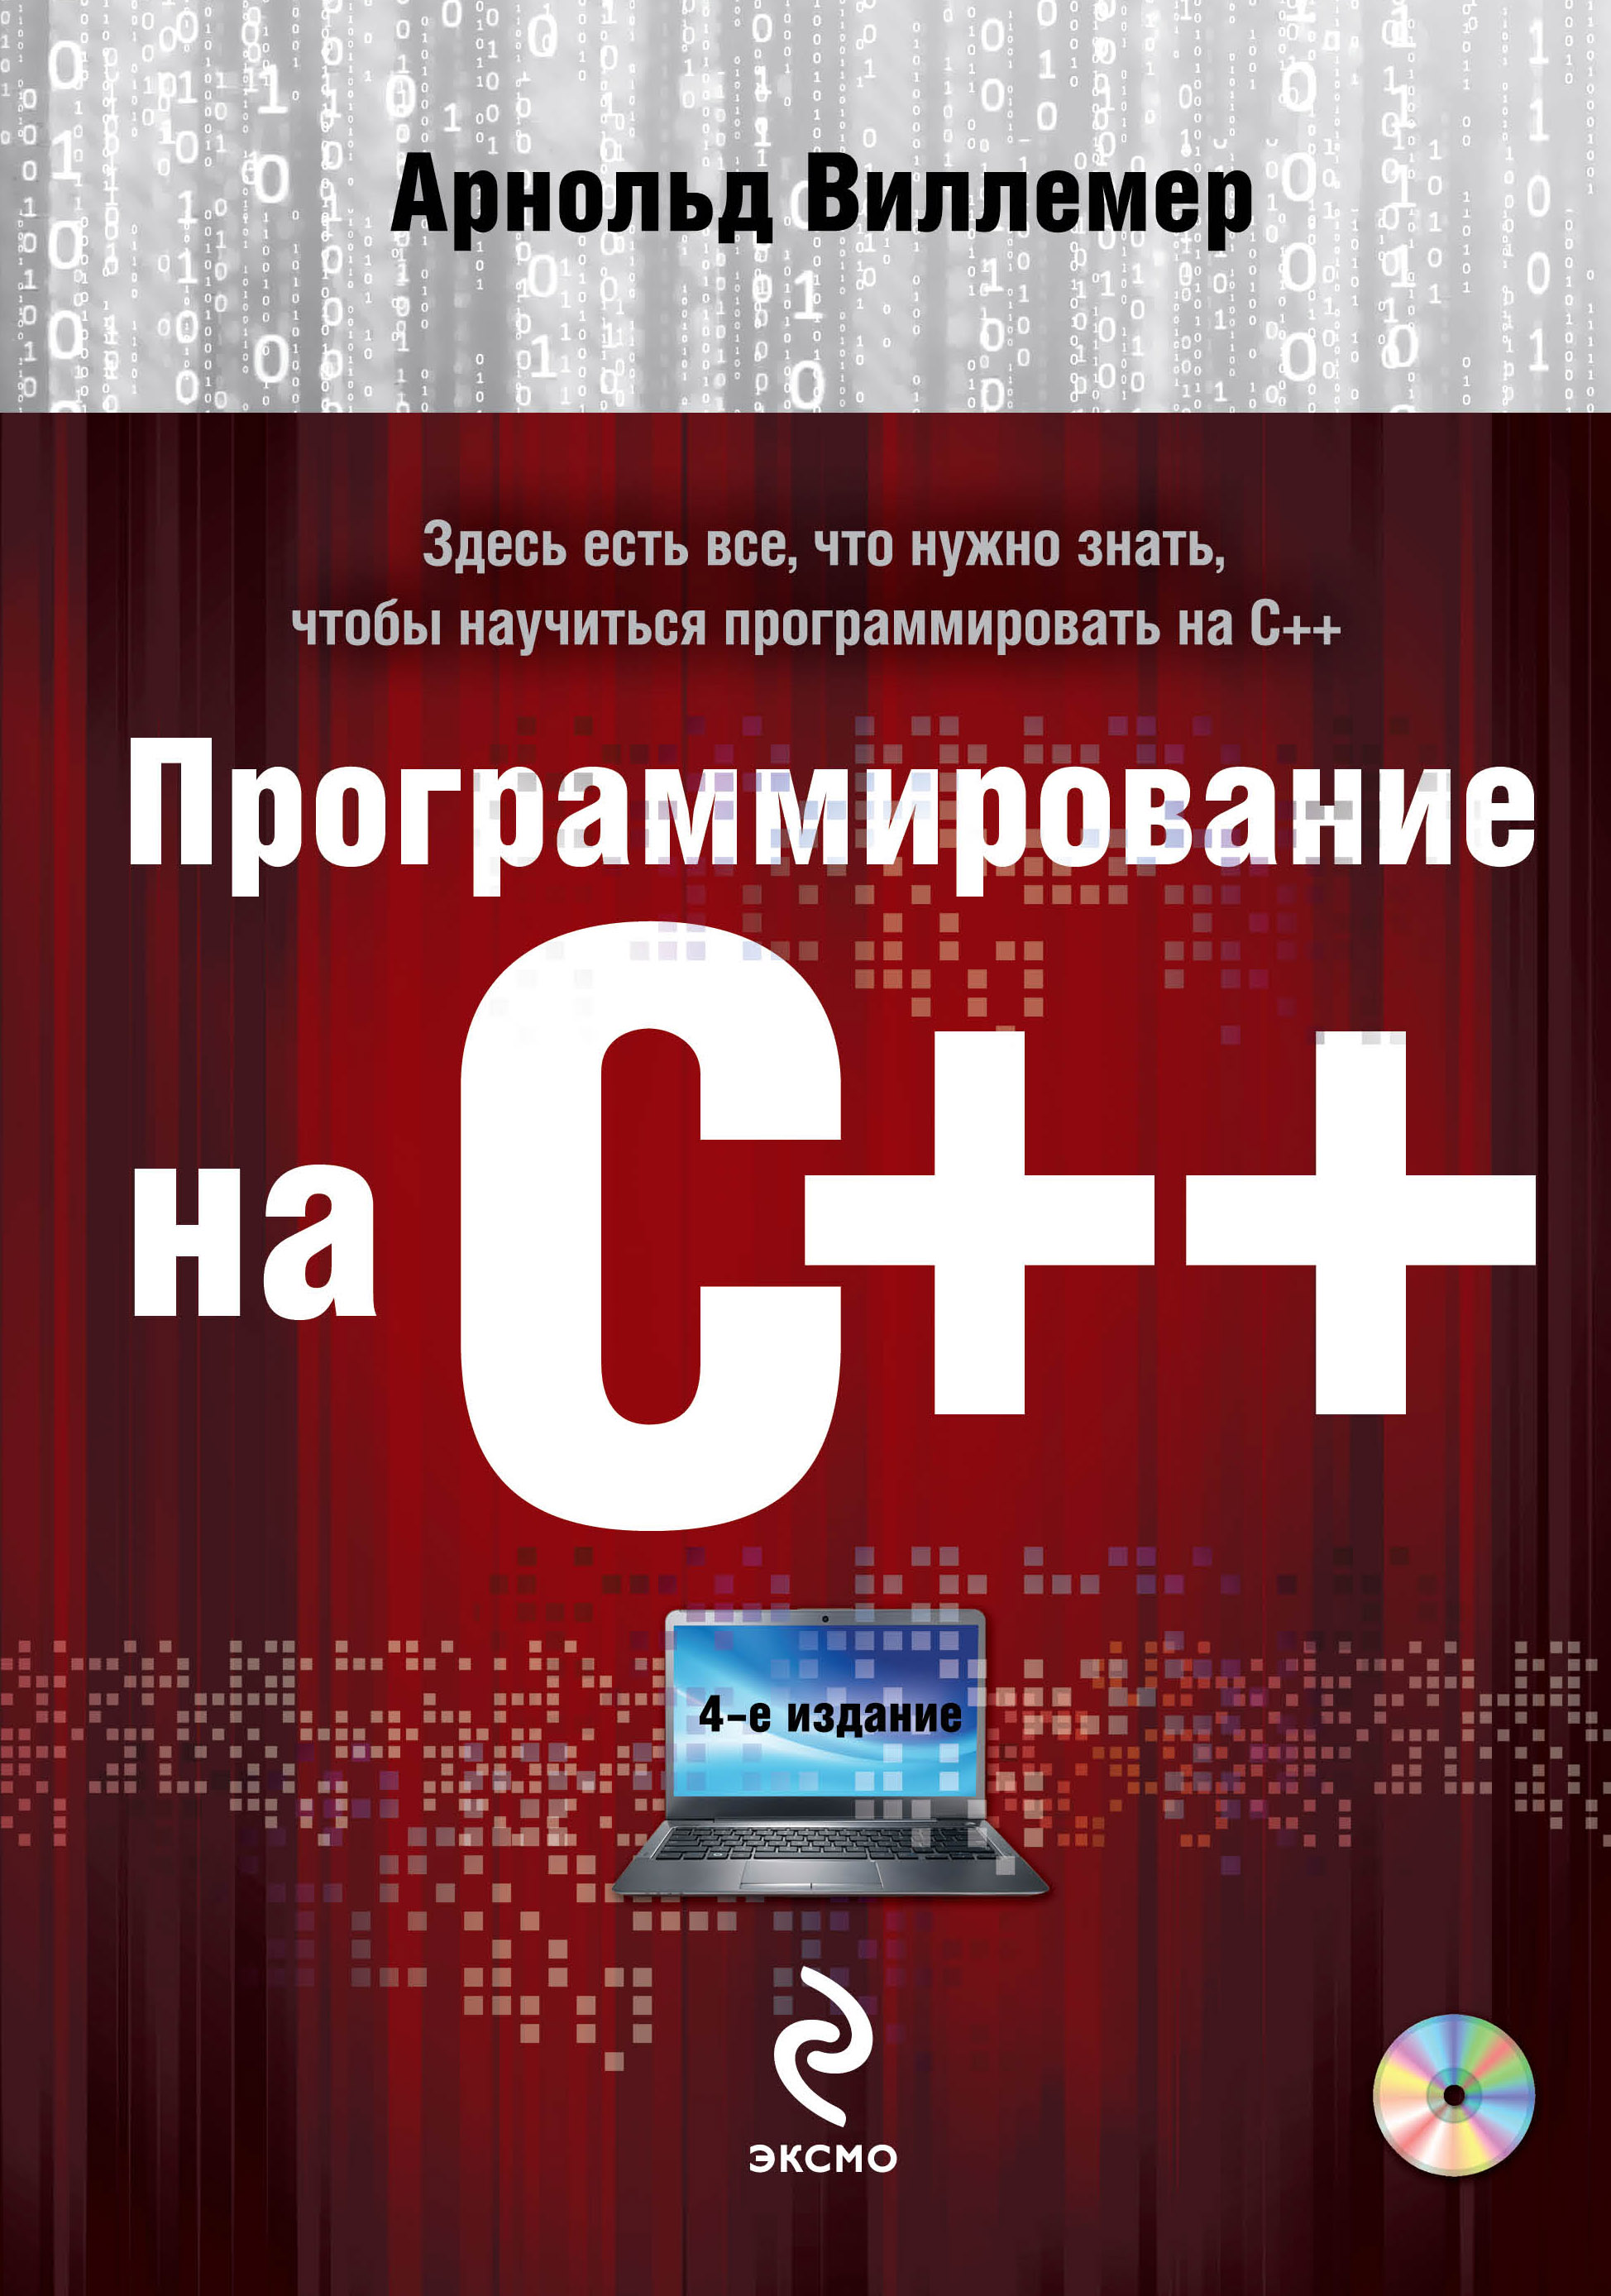 Виллемер А. Программирование на С++ (+DVD) красавица и чудовище dvd книга